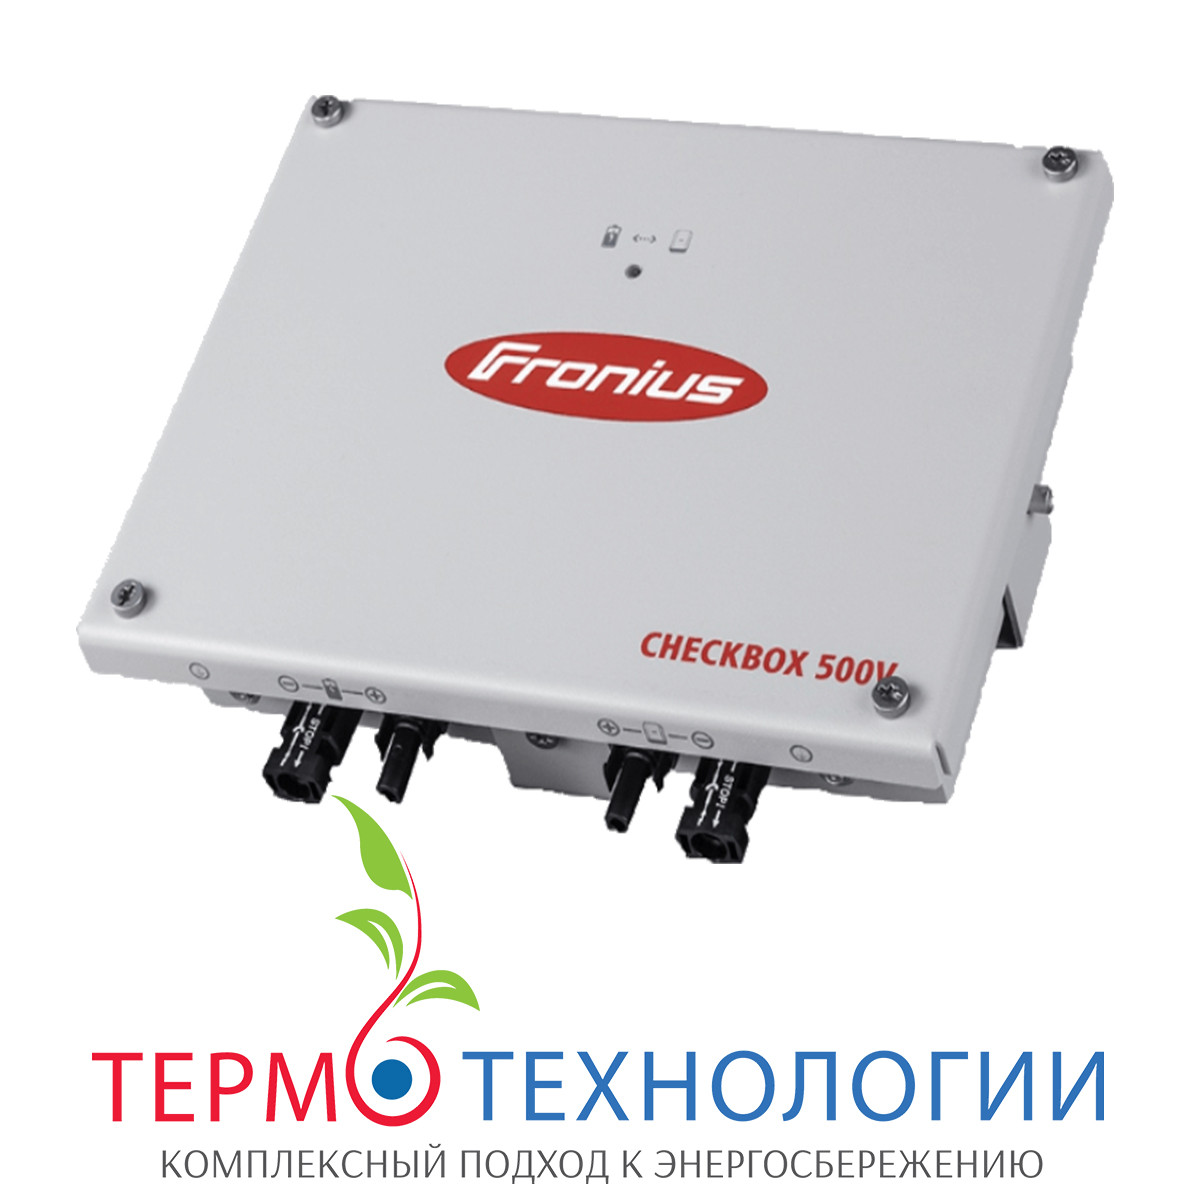 Checkbox Fronius для подключения аккумулятора LG CHEM HV